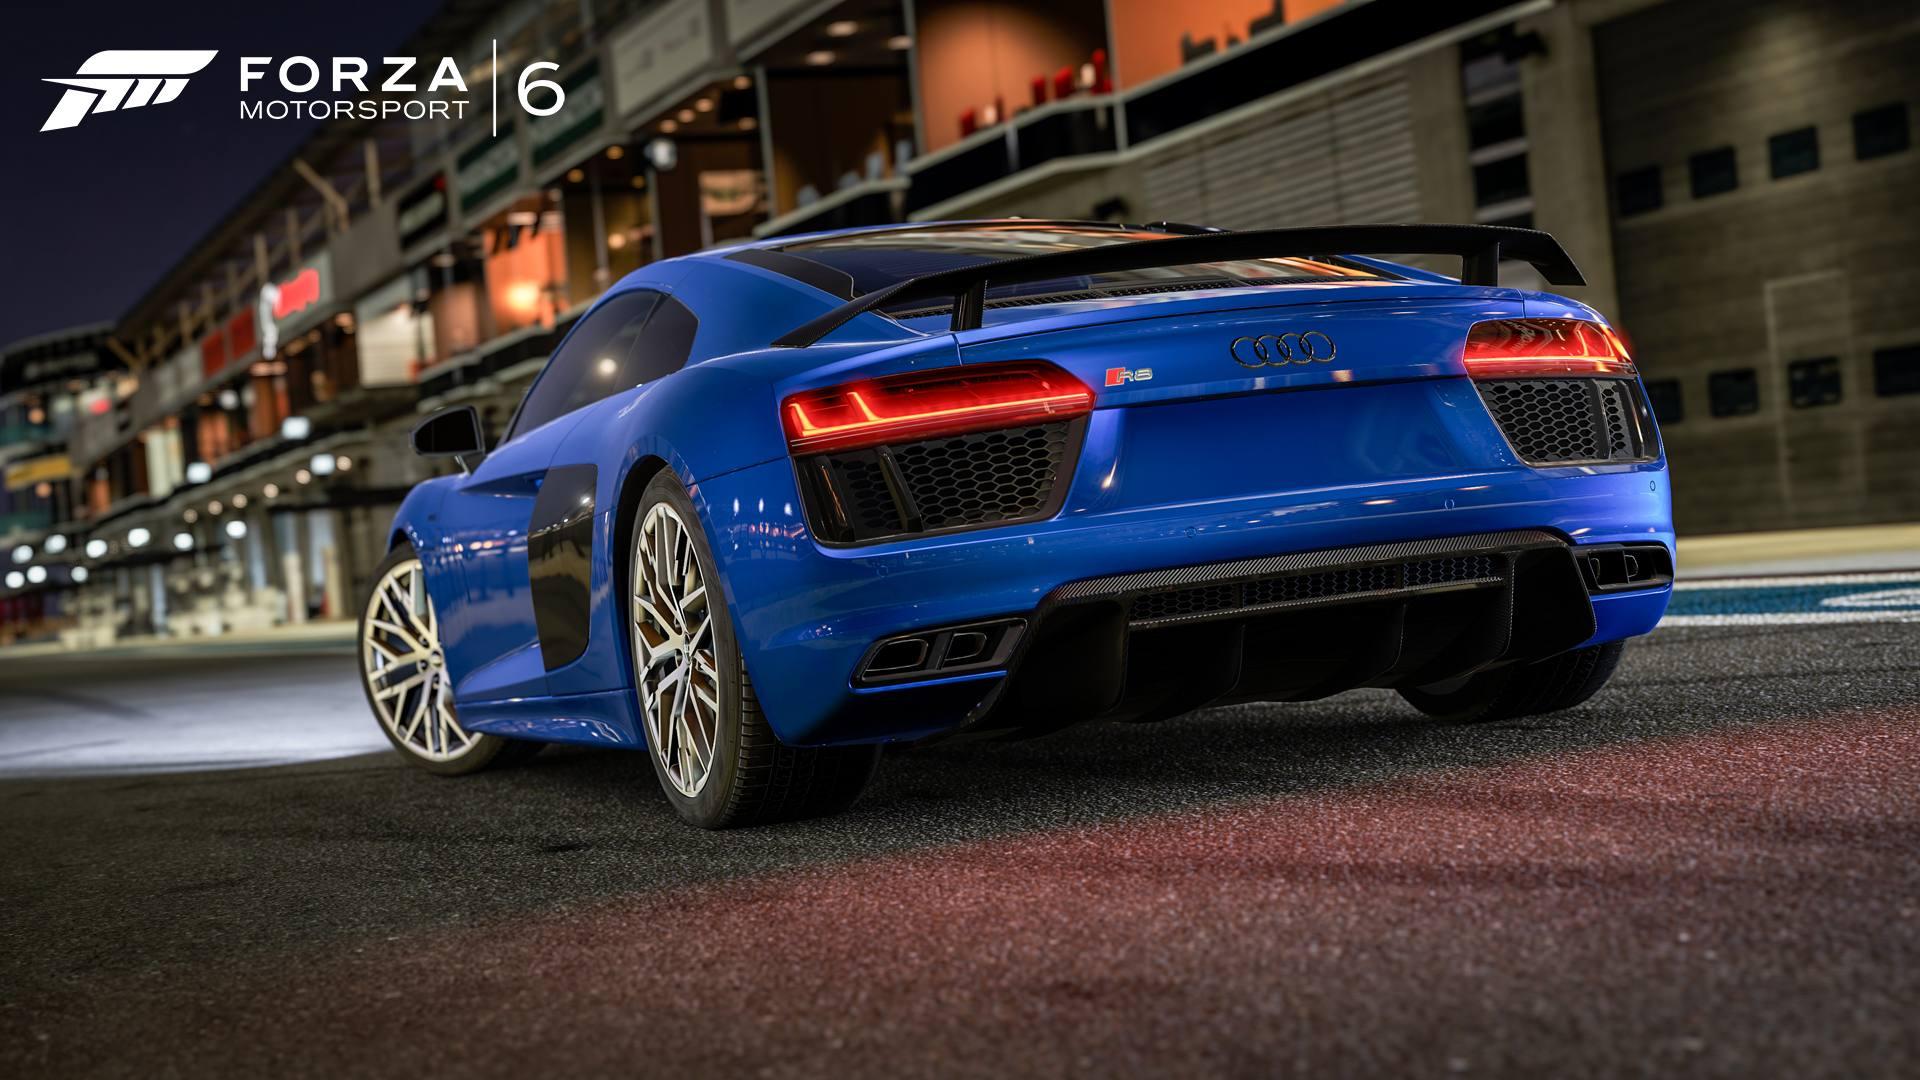 Forza Motorsport 6 2016 Audi R8 V10 plus 05-04-16 001